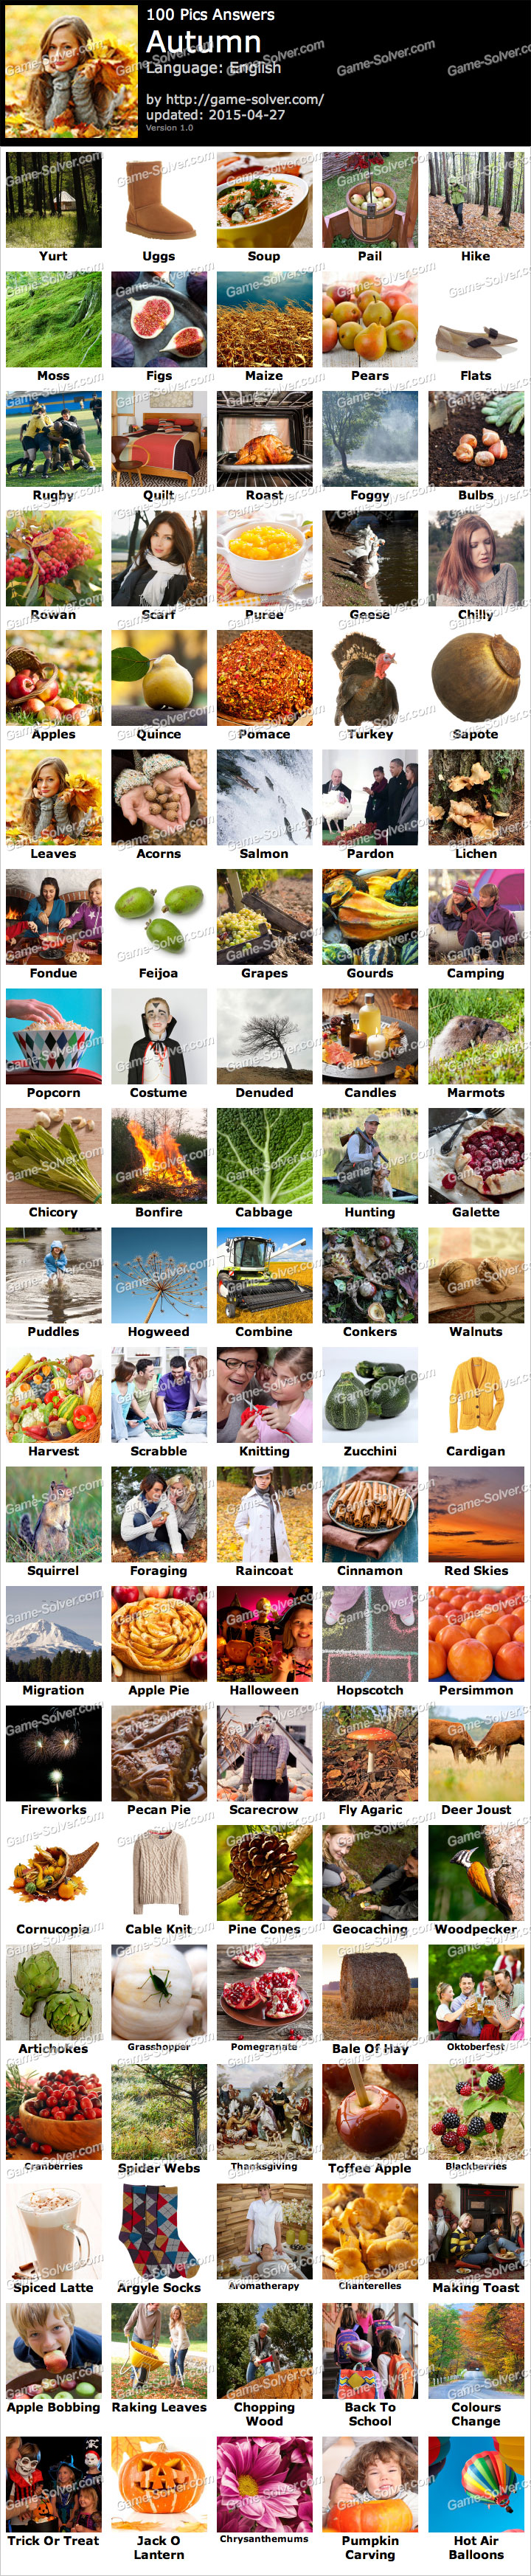 100 Pics: Holiday Logos Answers - App Cheaters